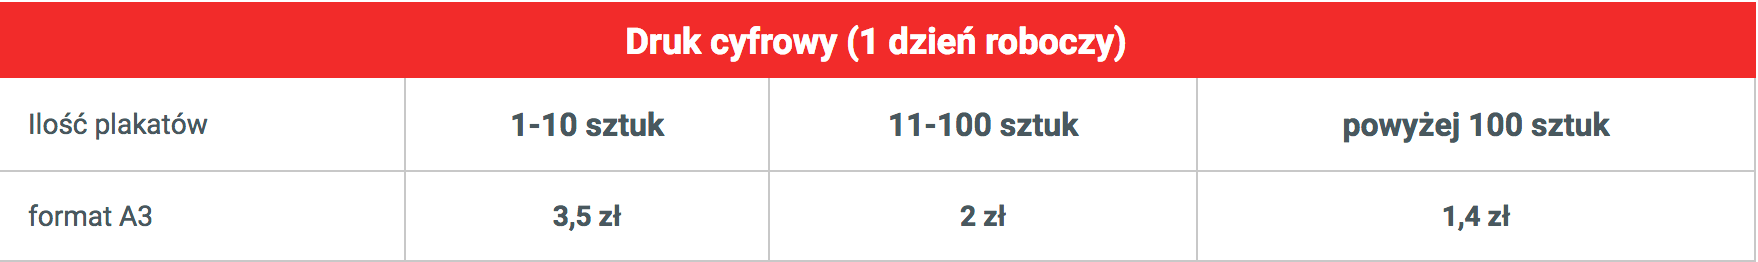 Druk Plakatów Kraków Cennik Copyshop Drukarnia Cyfrowa